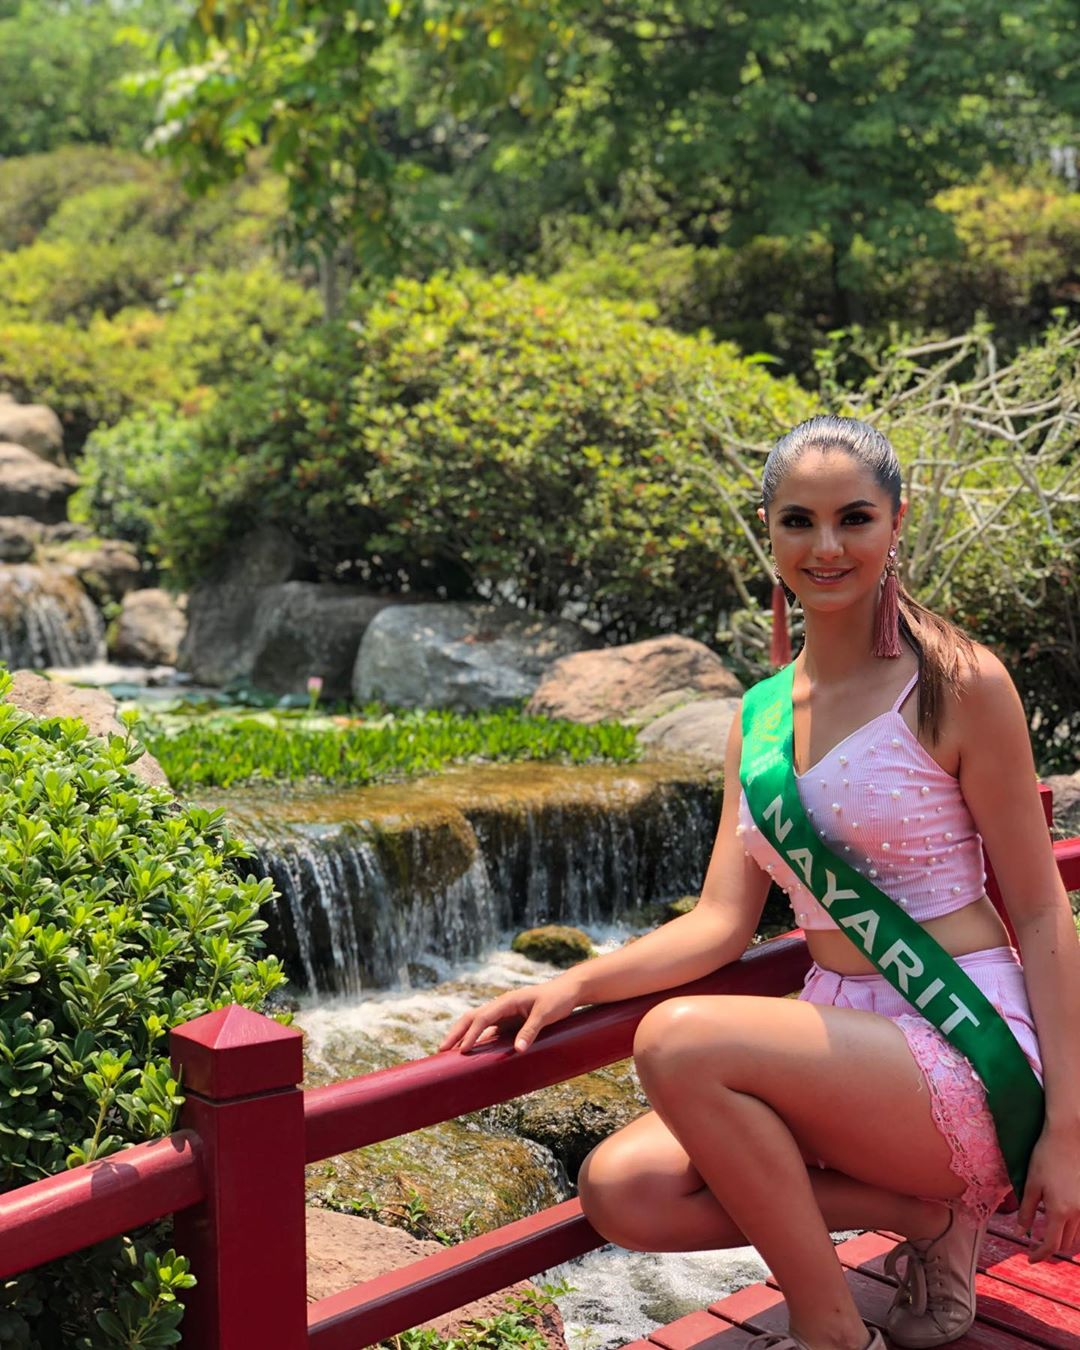 hilary islas, miss earth mexico 2019. - Página 5 59547310